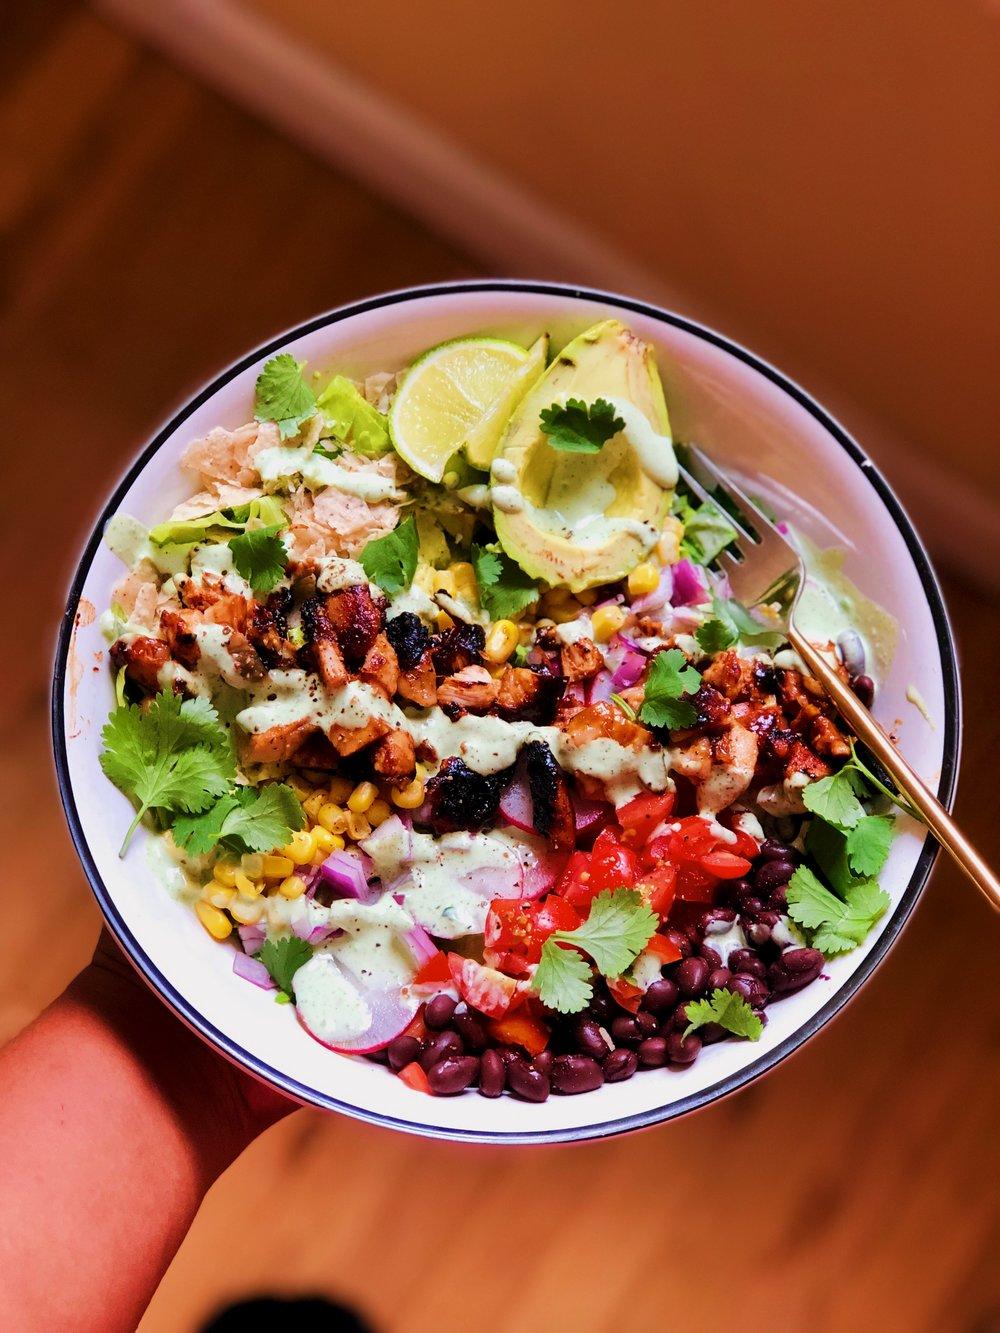 IMG_9522.JPGBBQ Chopped Chicken Salad | recipe from tatichin.com